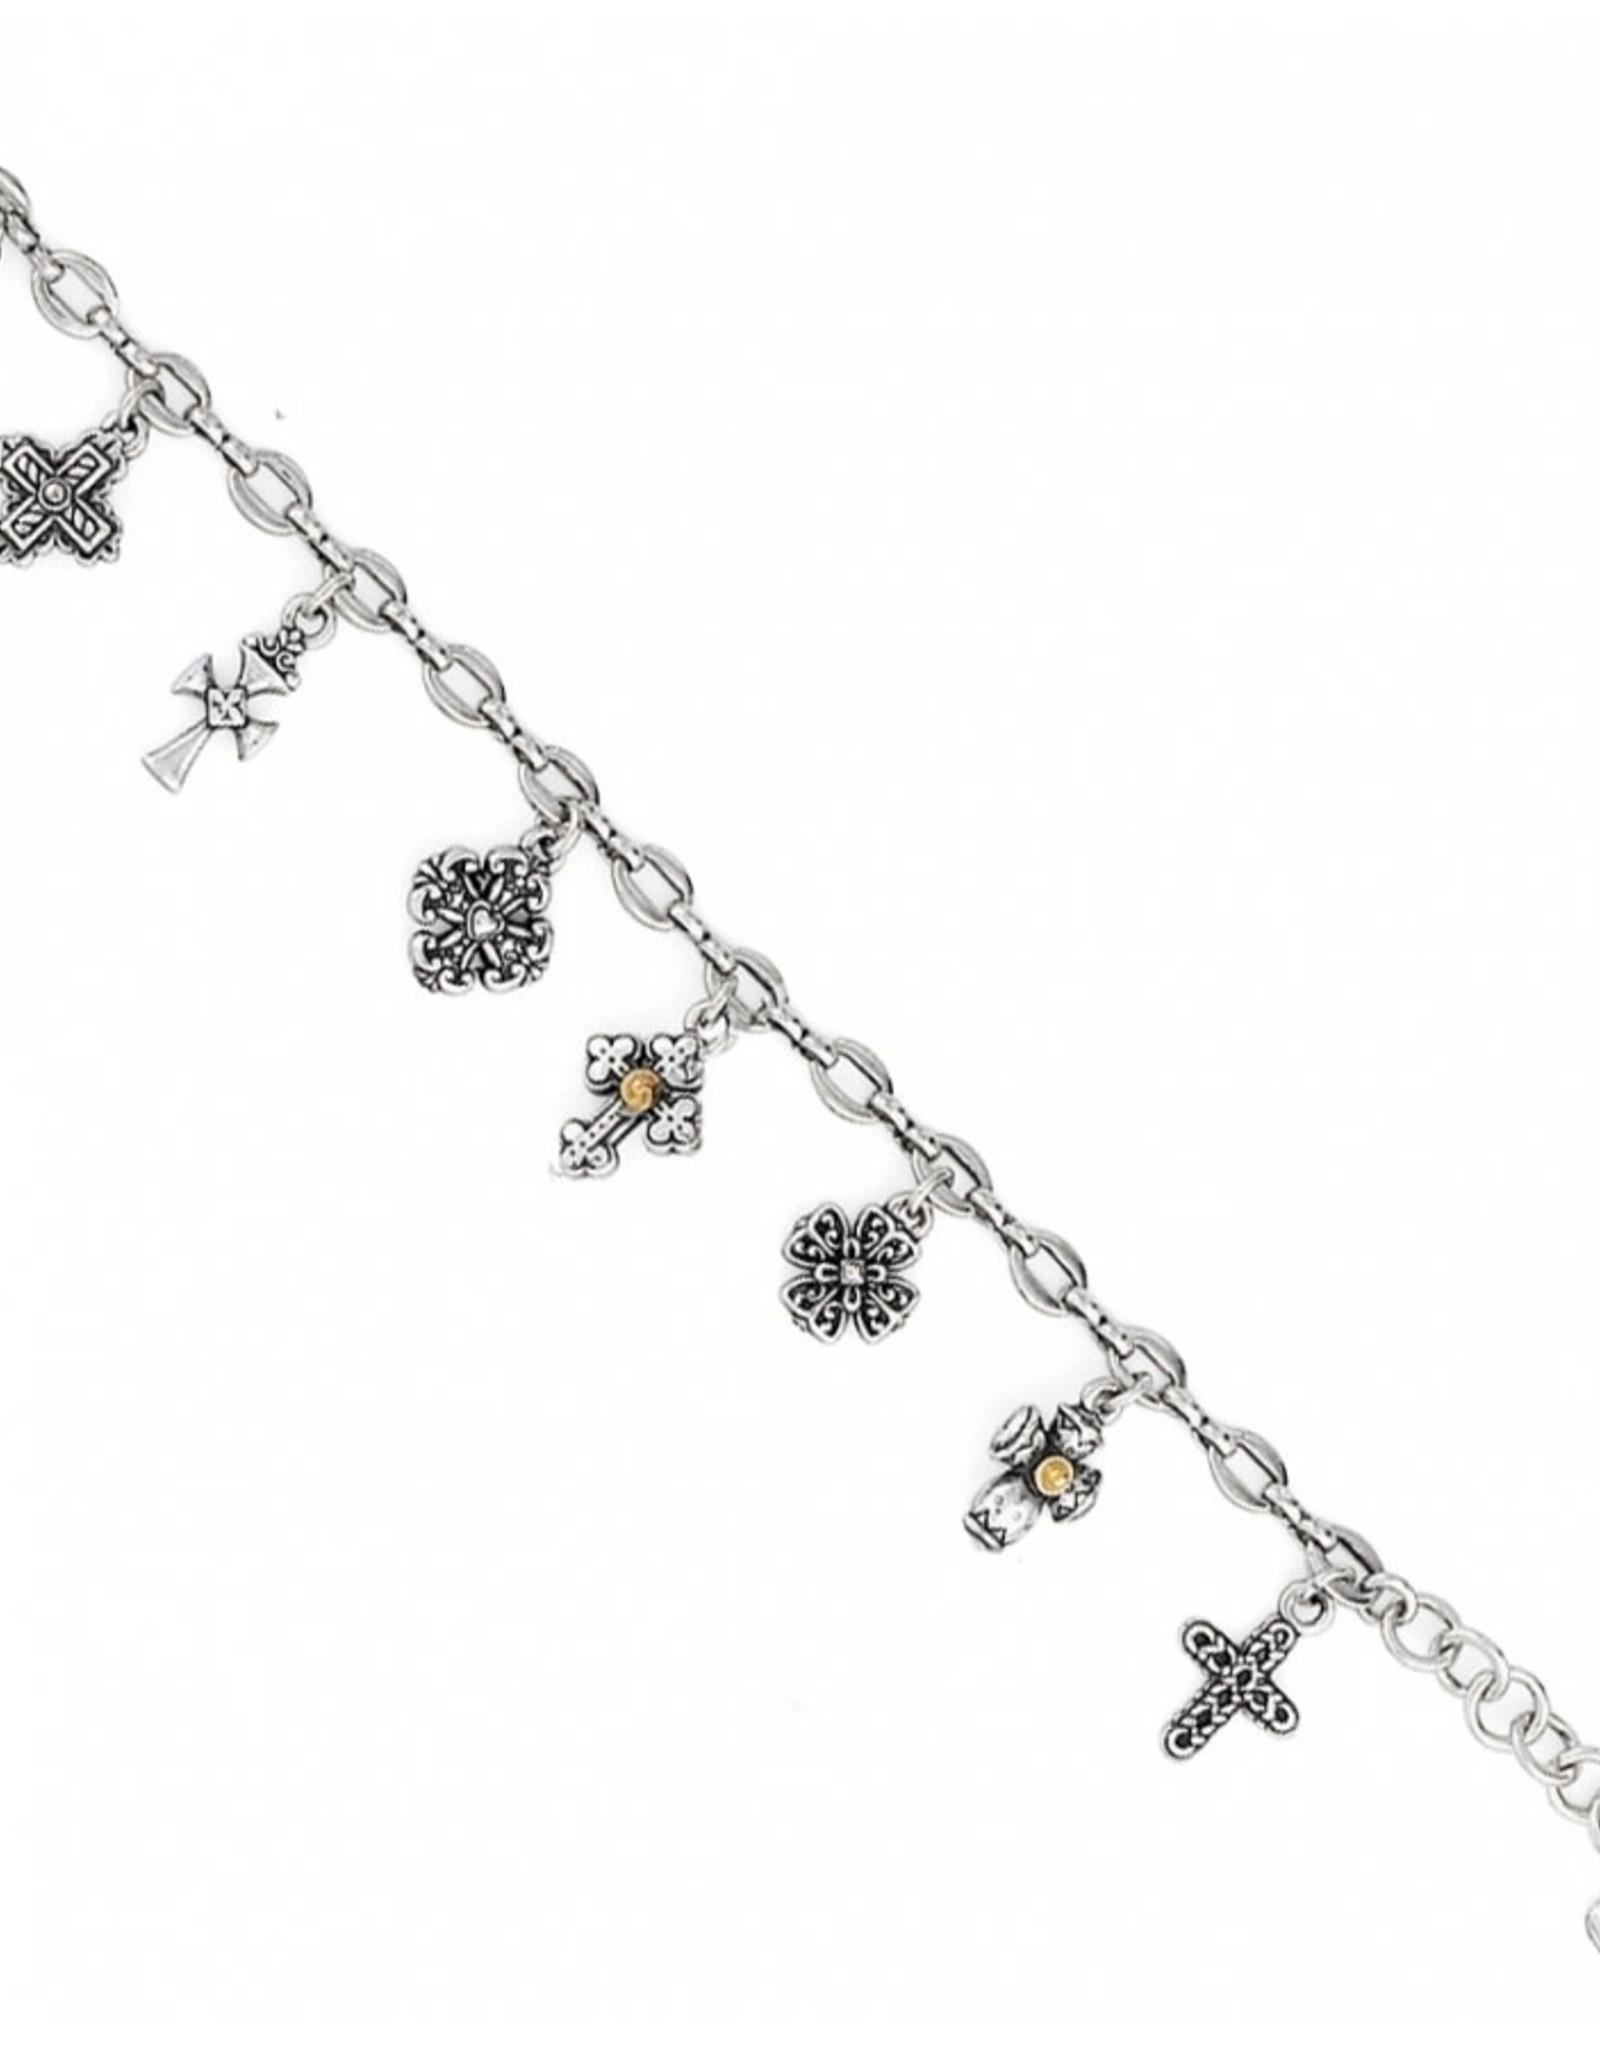 Brighton Silver Eternity Cross Charm Bracelet